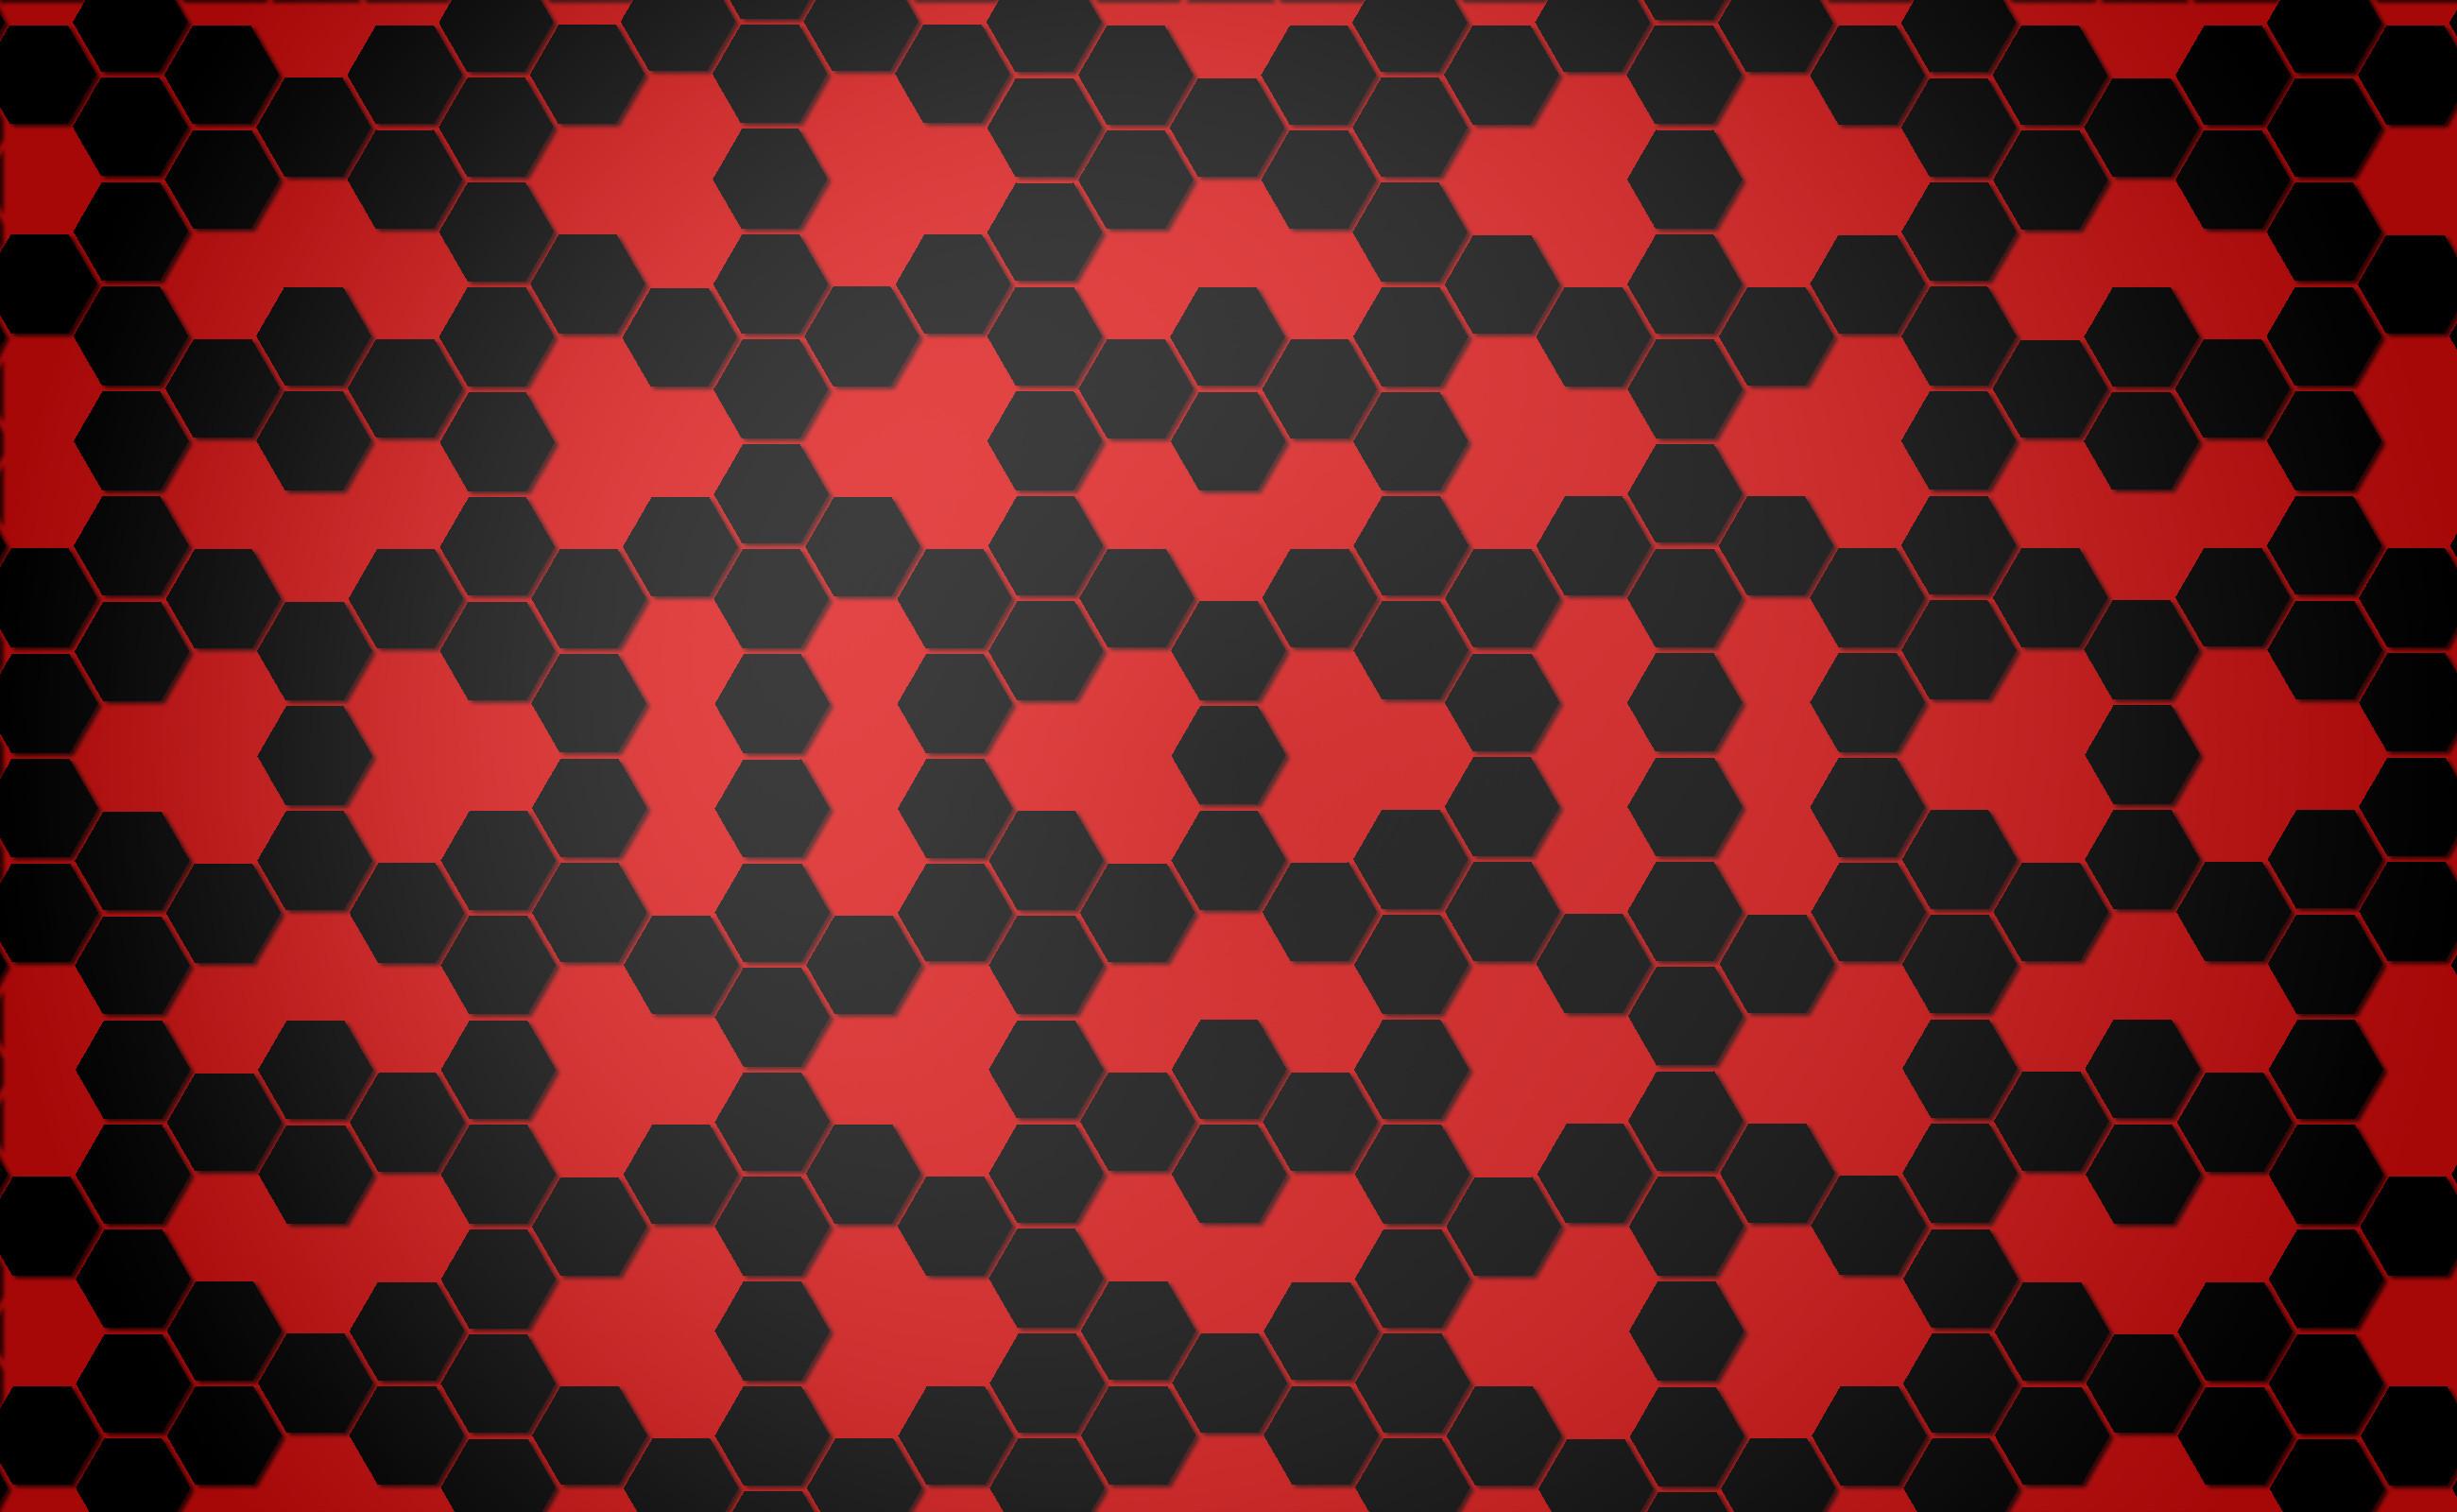 Background black and red hexagon Computer Wallpapers, Desktop .